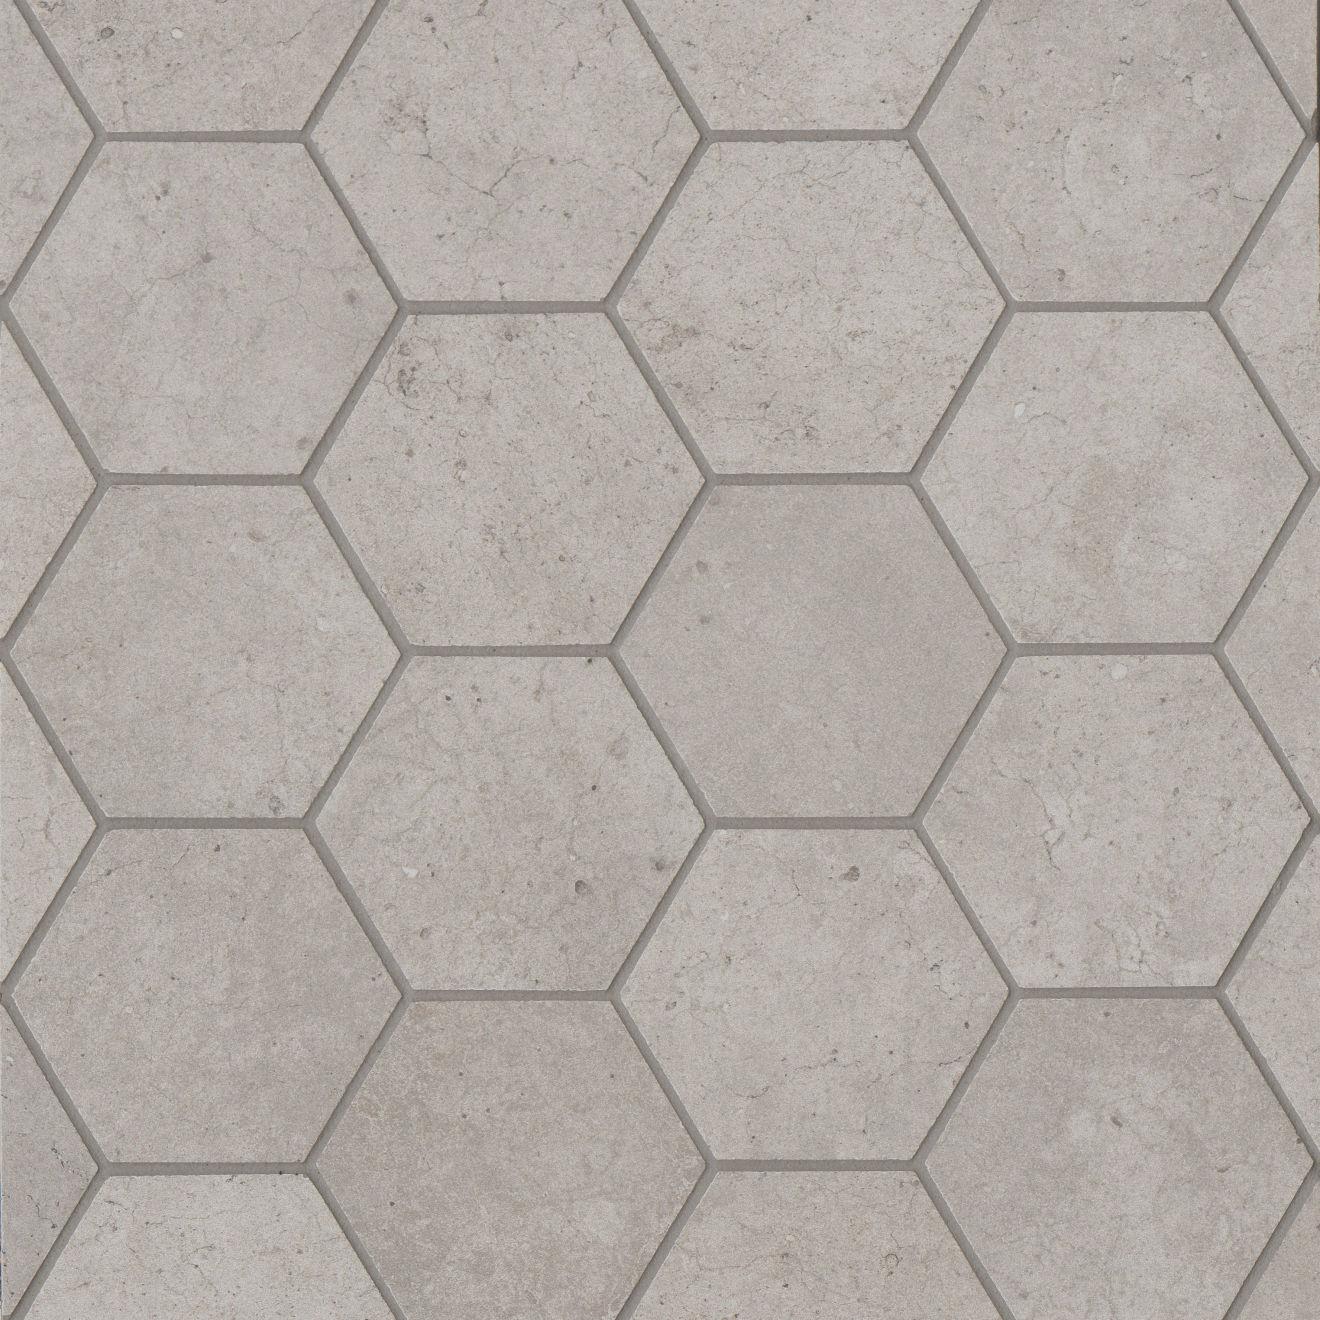 "Materika 3"" Hexagon Matte Porcelain Mosaic in Greige"